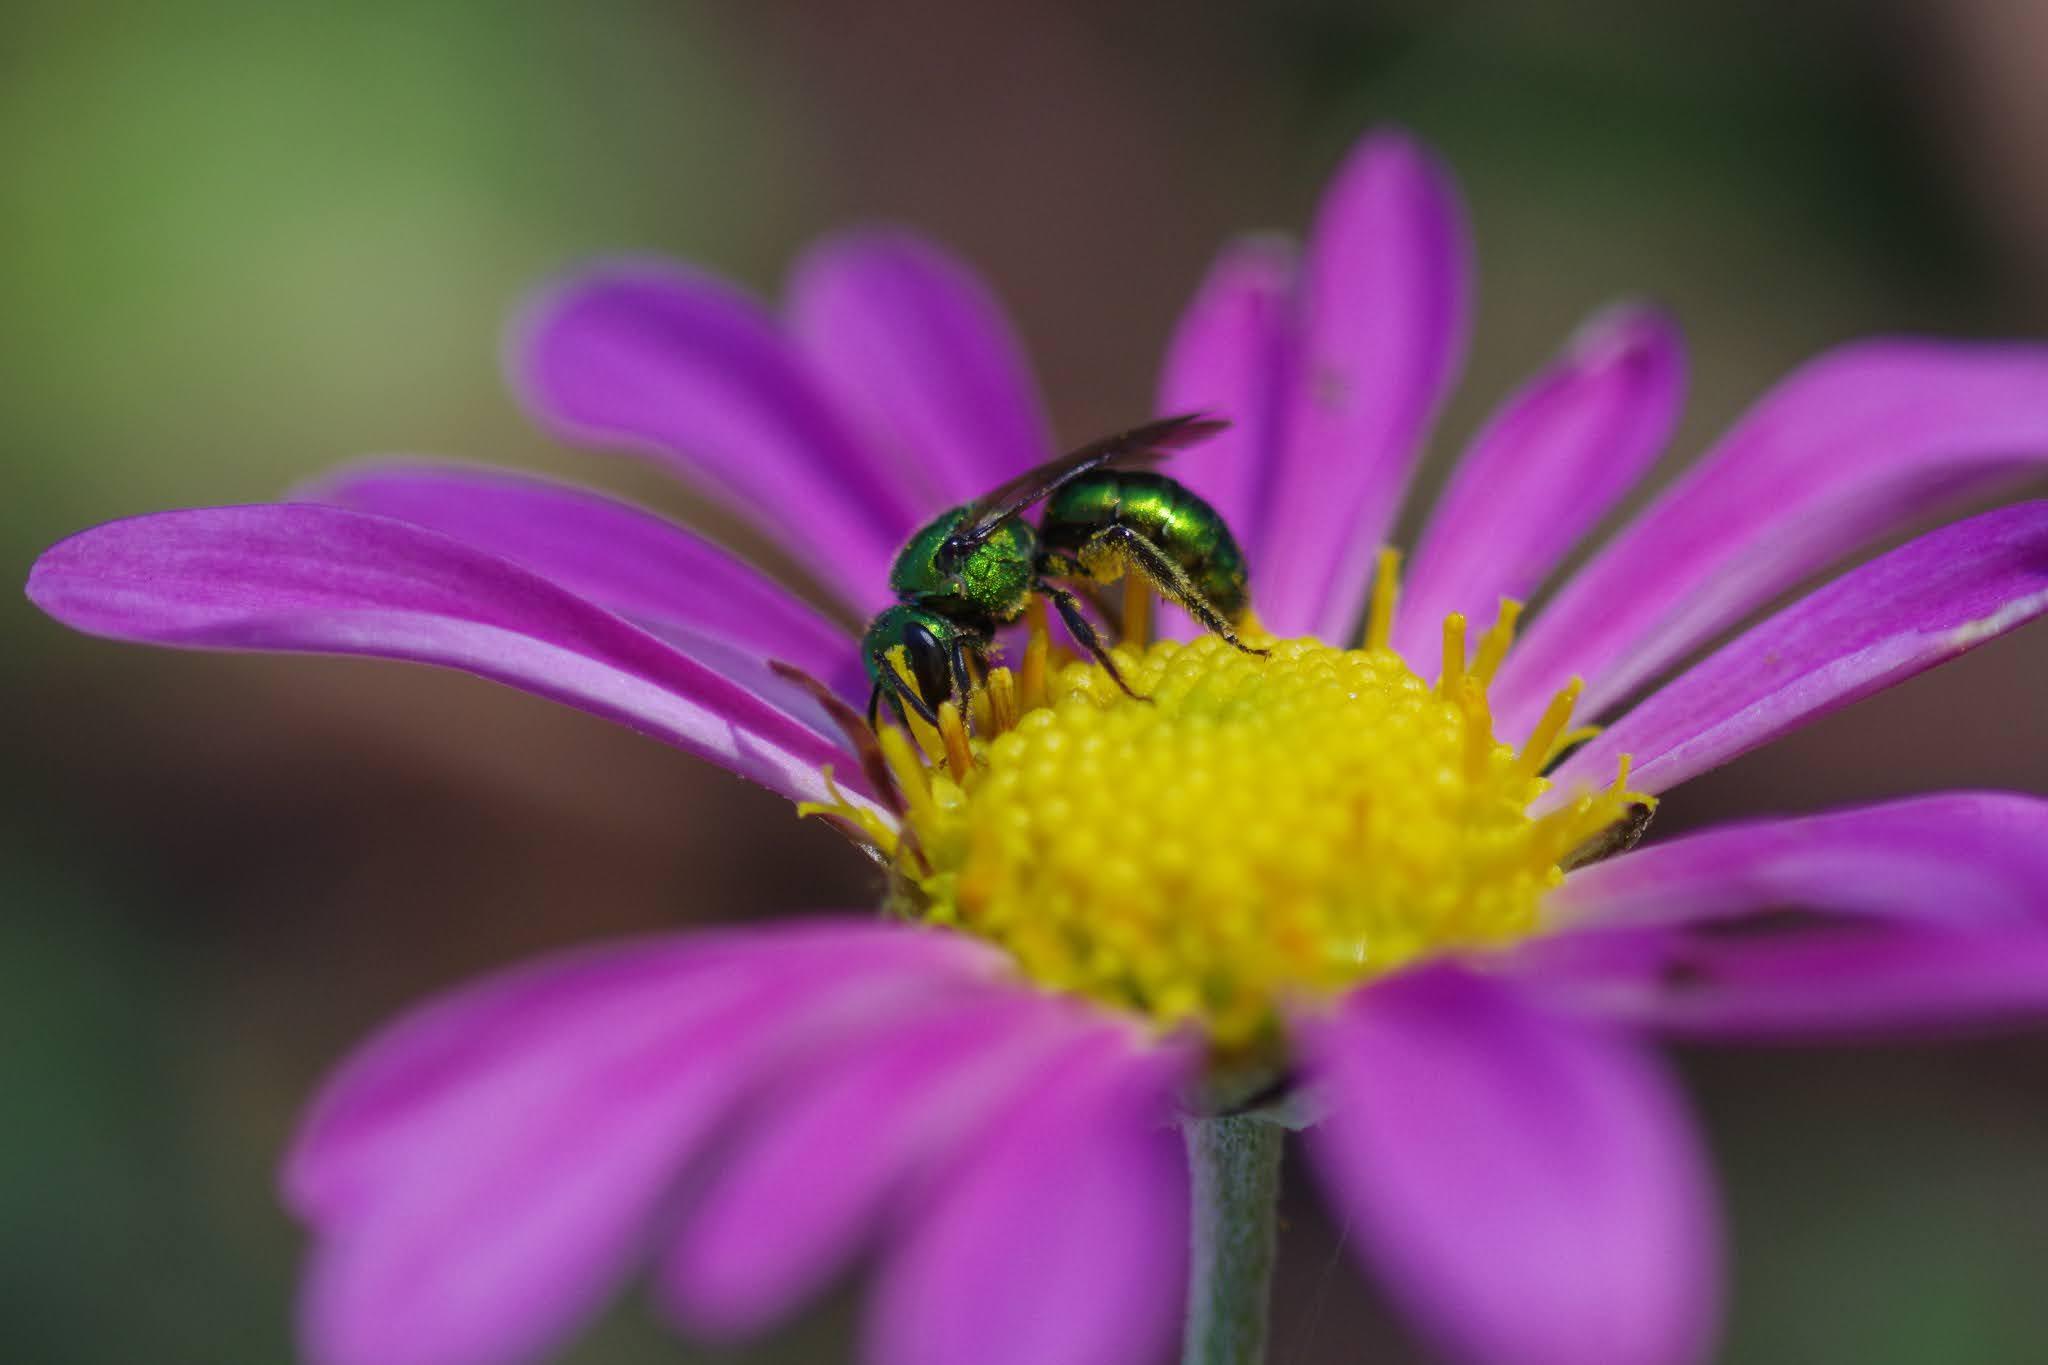 The Bugs in the Backyard